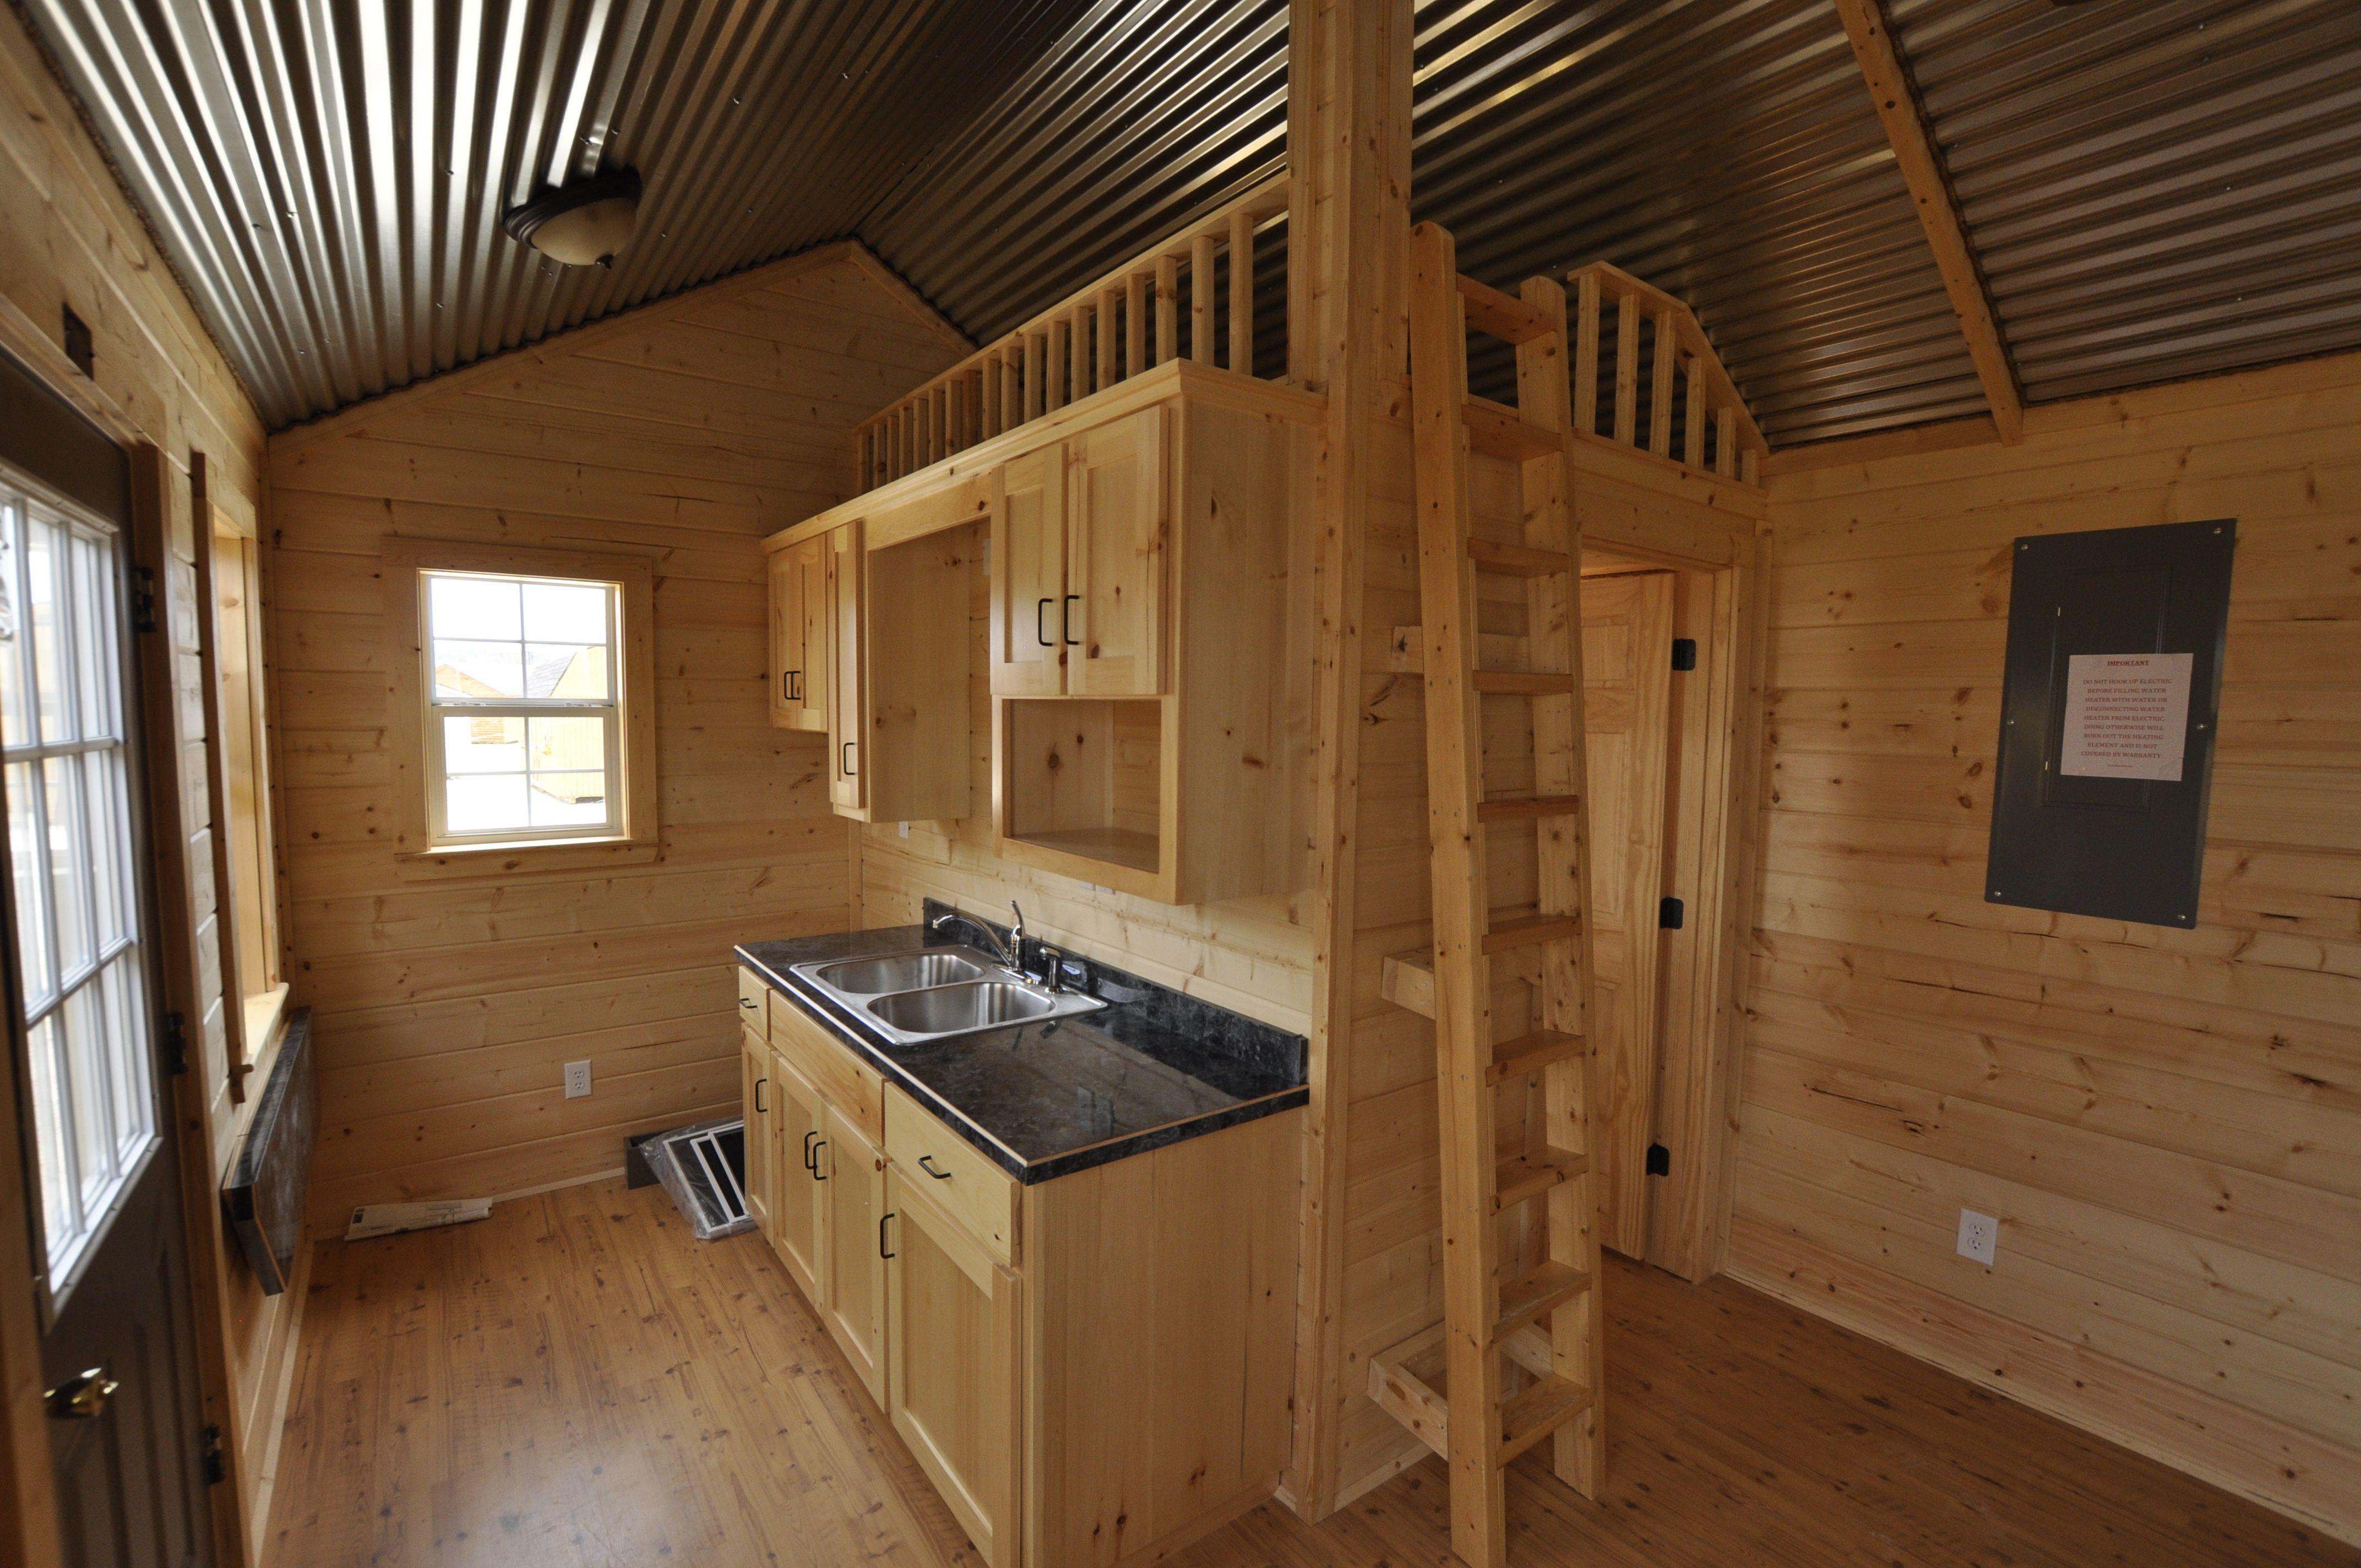 image result for ulrich log cabins craftsman series casita image result for ulrich log cabins craftsman series